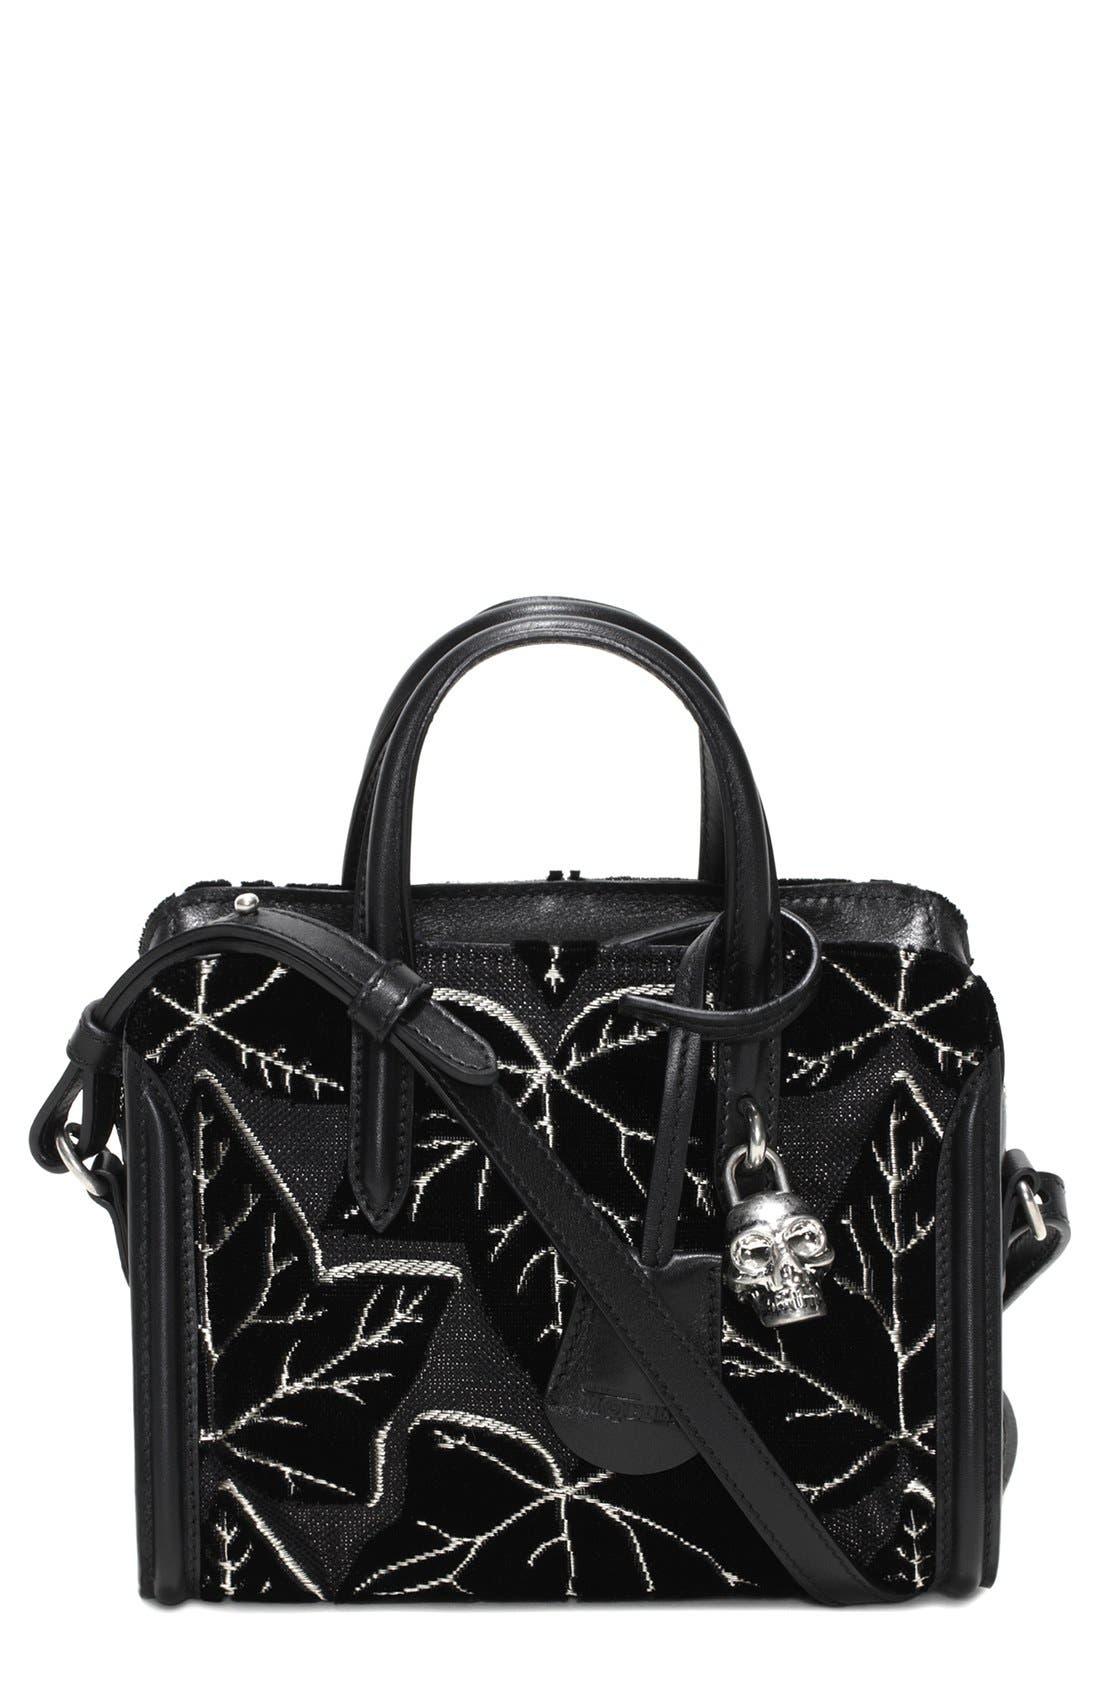 Alternate Image 1 Selected - Alexander McQueen 'Mini Padlock' Velvet Duffel Bag